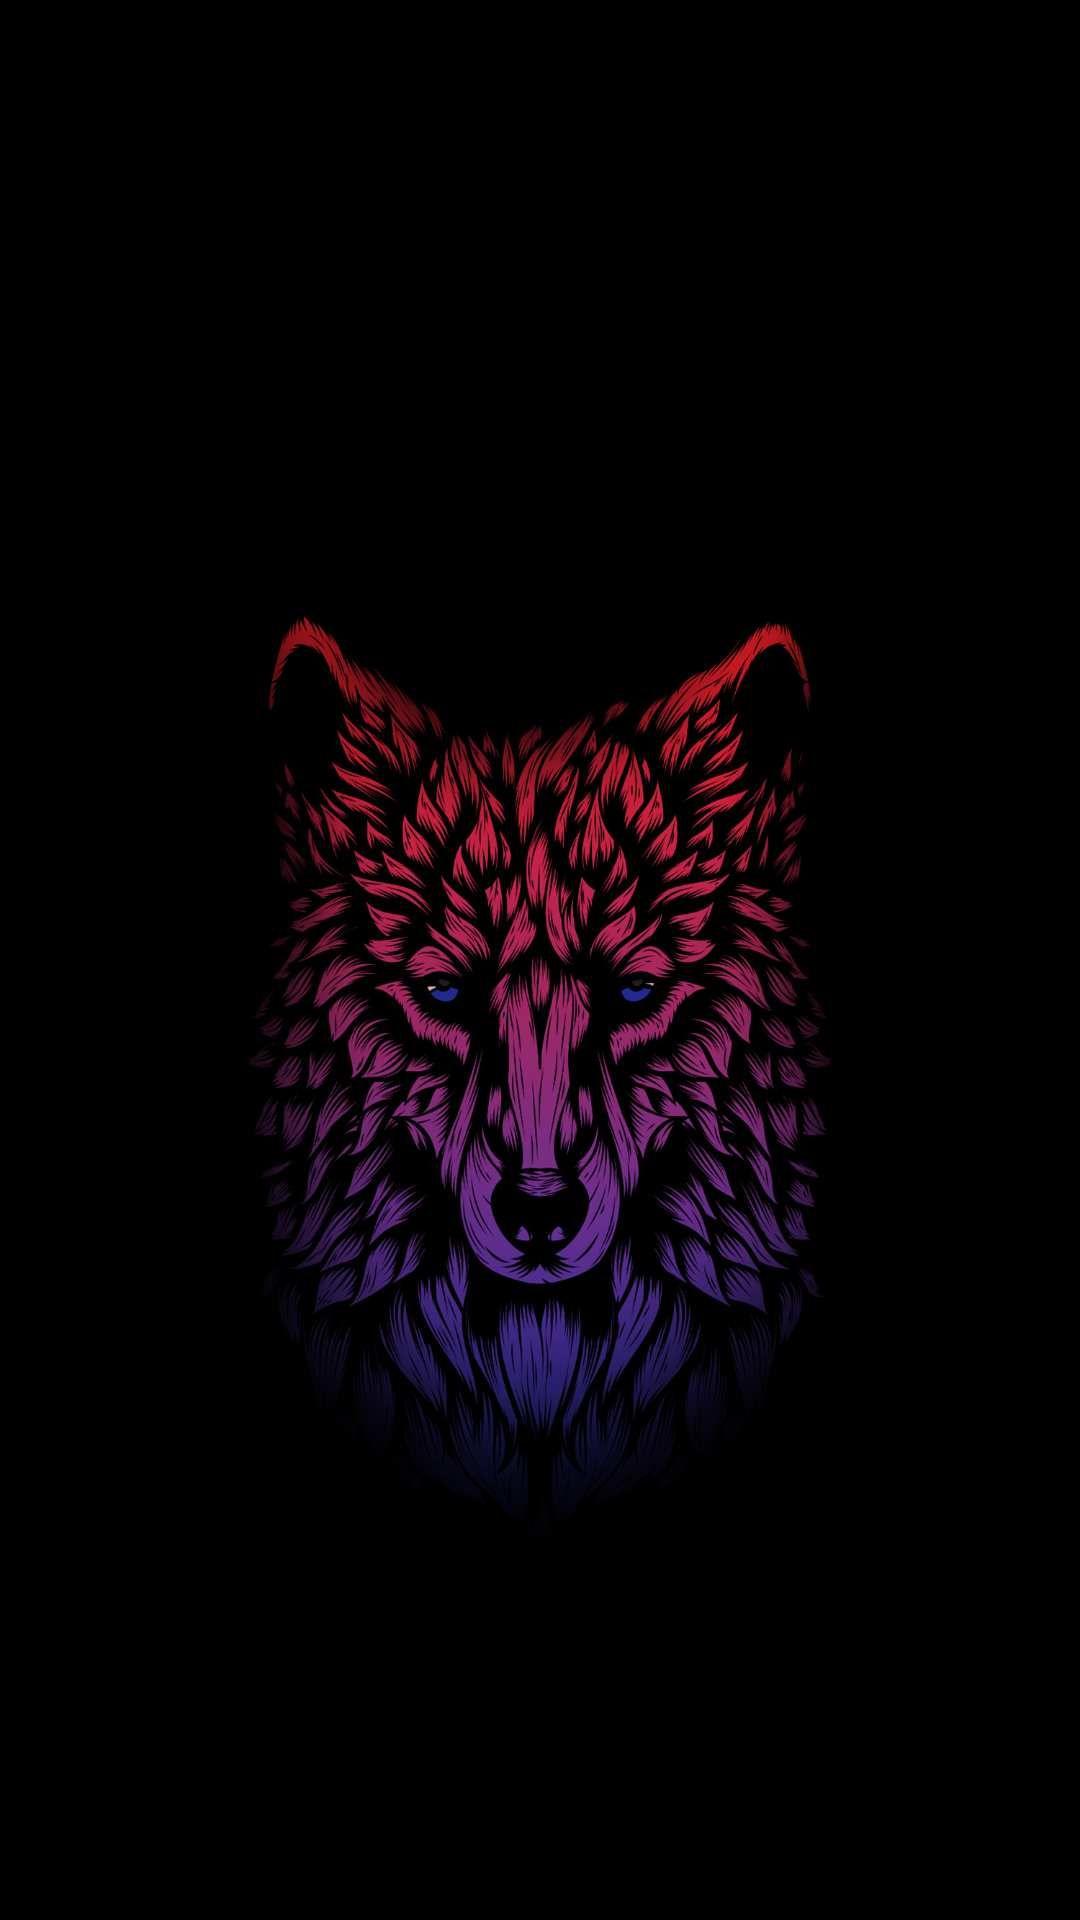 Minimal Dark Wolf Art Iphone Wallpaper Wolf Wallpaper Wolf Art